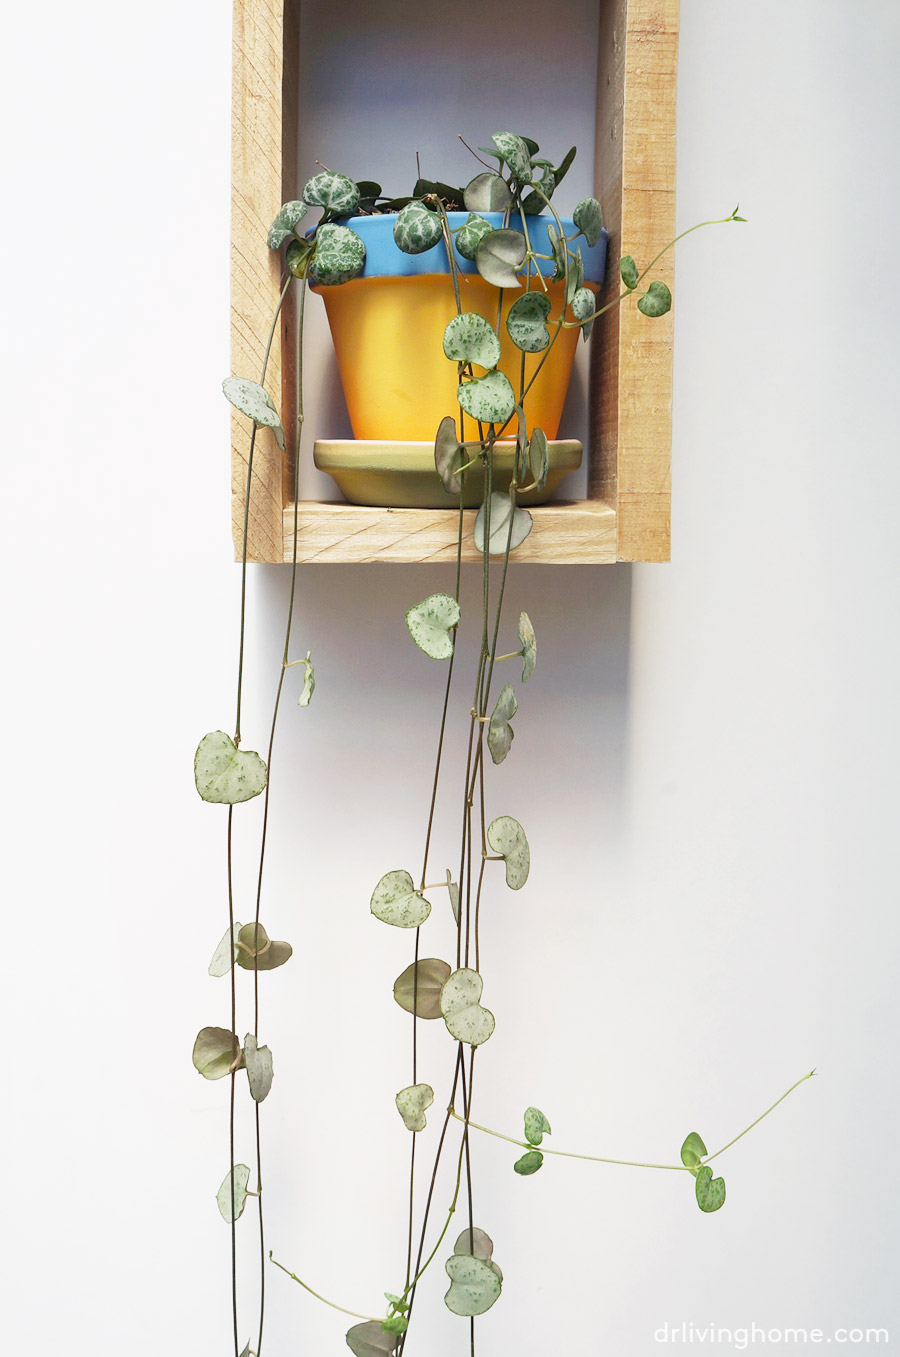 Diy jard n vertical mini en 4 pasos blog decoraci n con for Jardin vertical pequeno